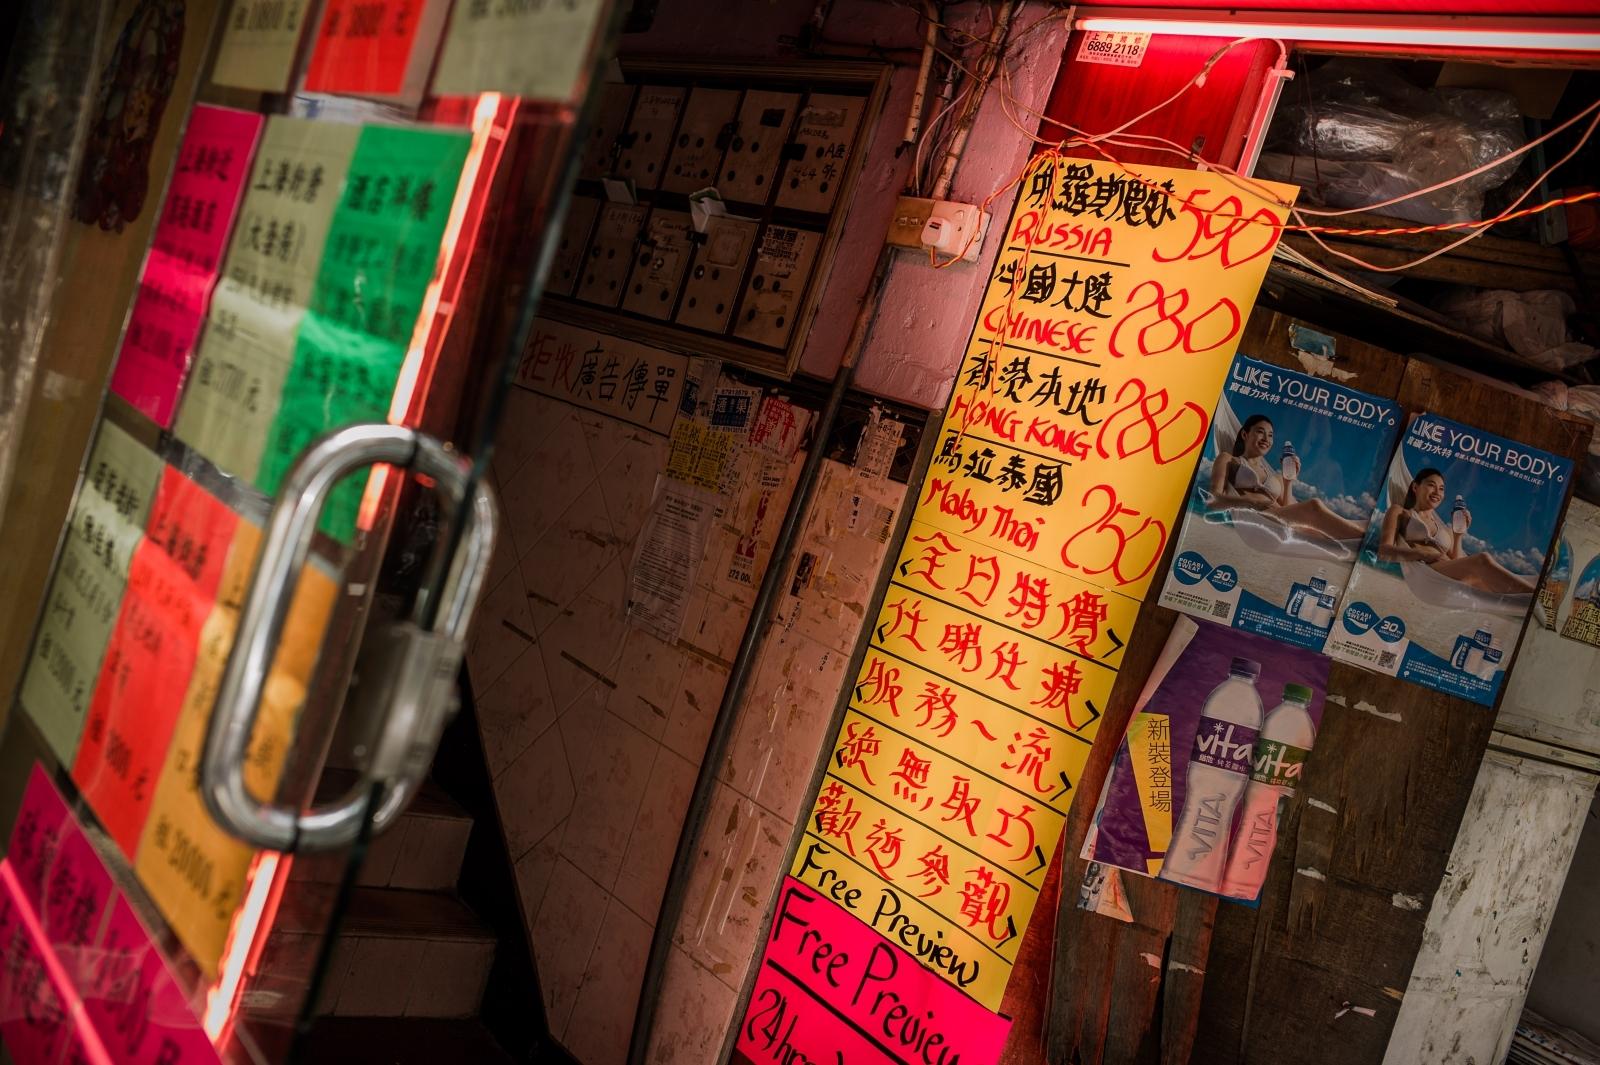 China Baidu maps shows prostitutes